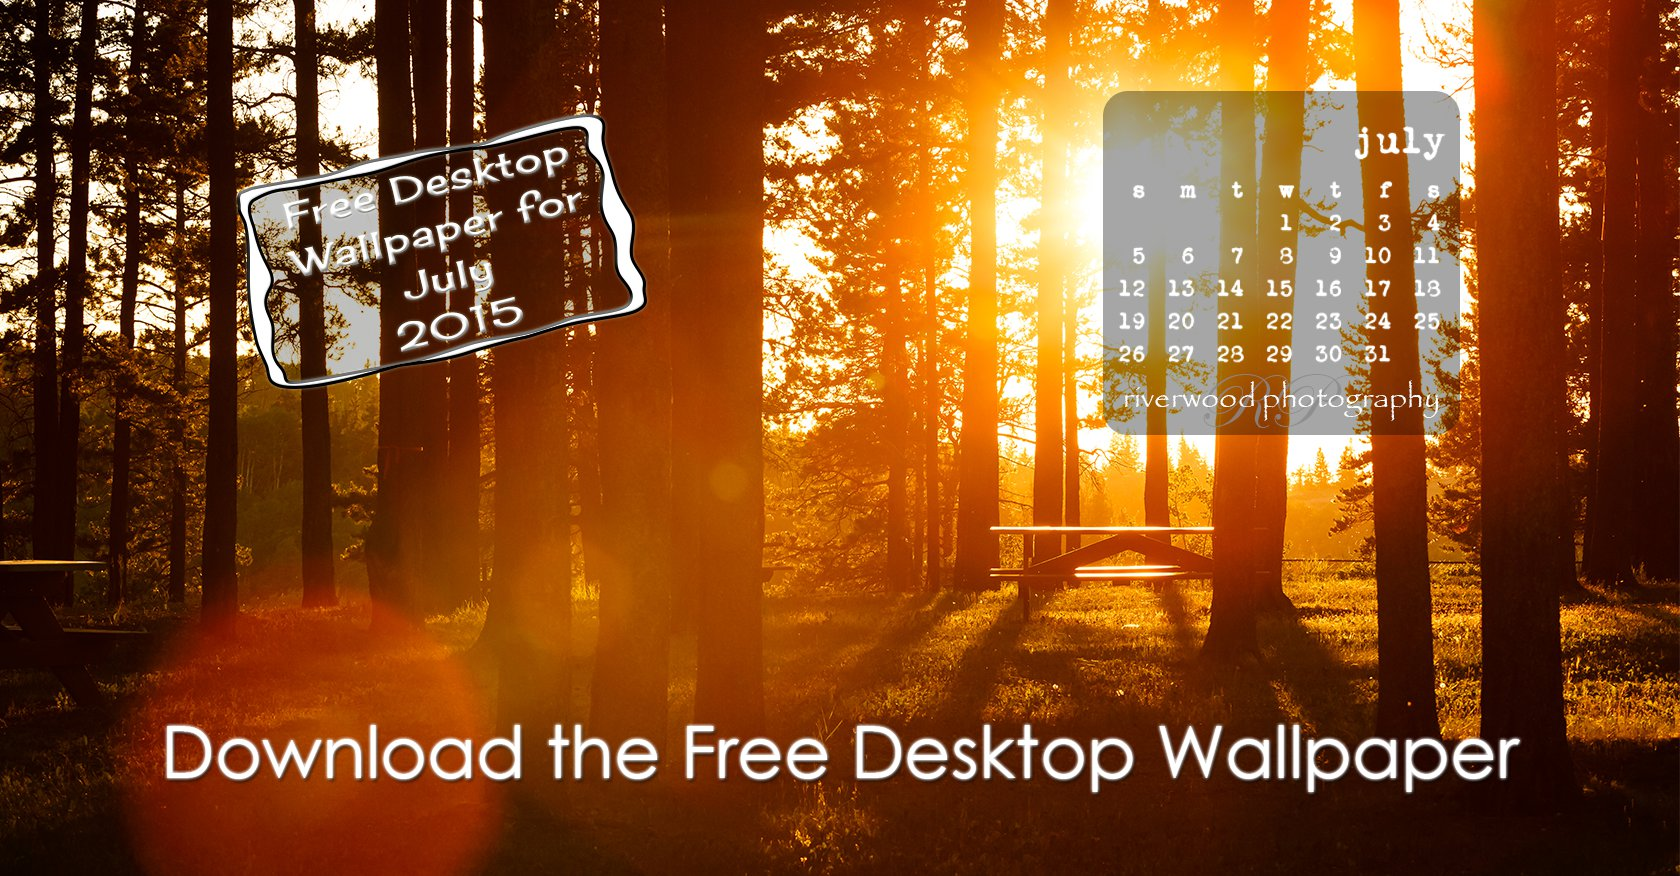 Free Desktop Wallpaper for July 2015